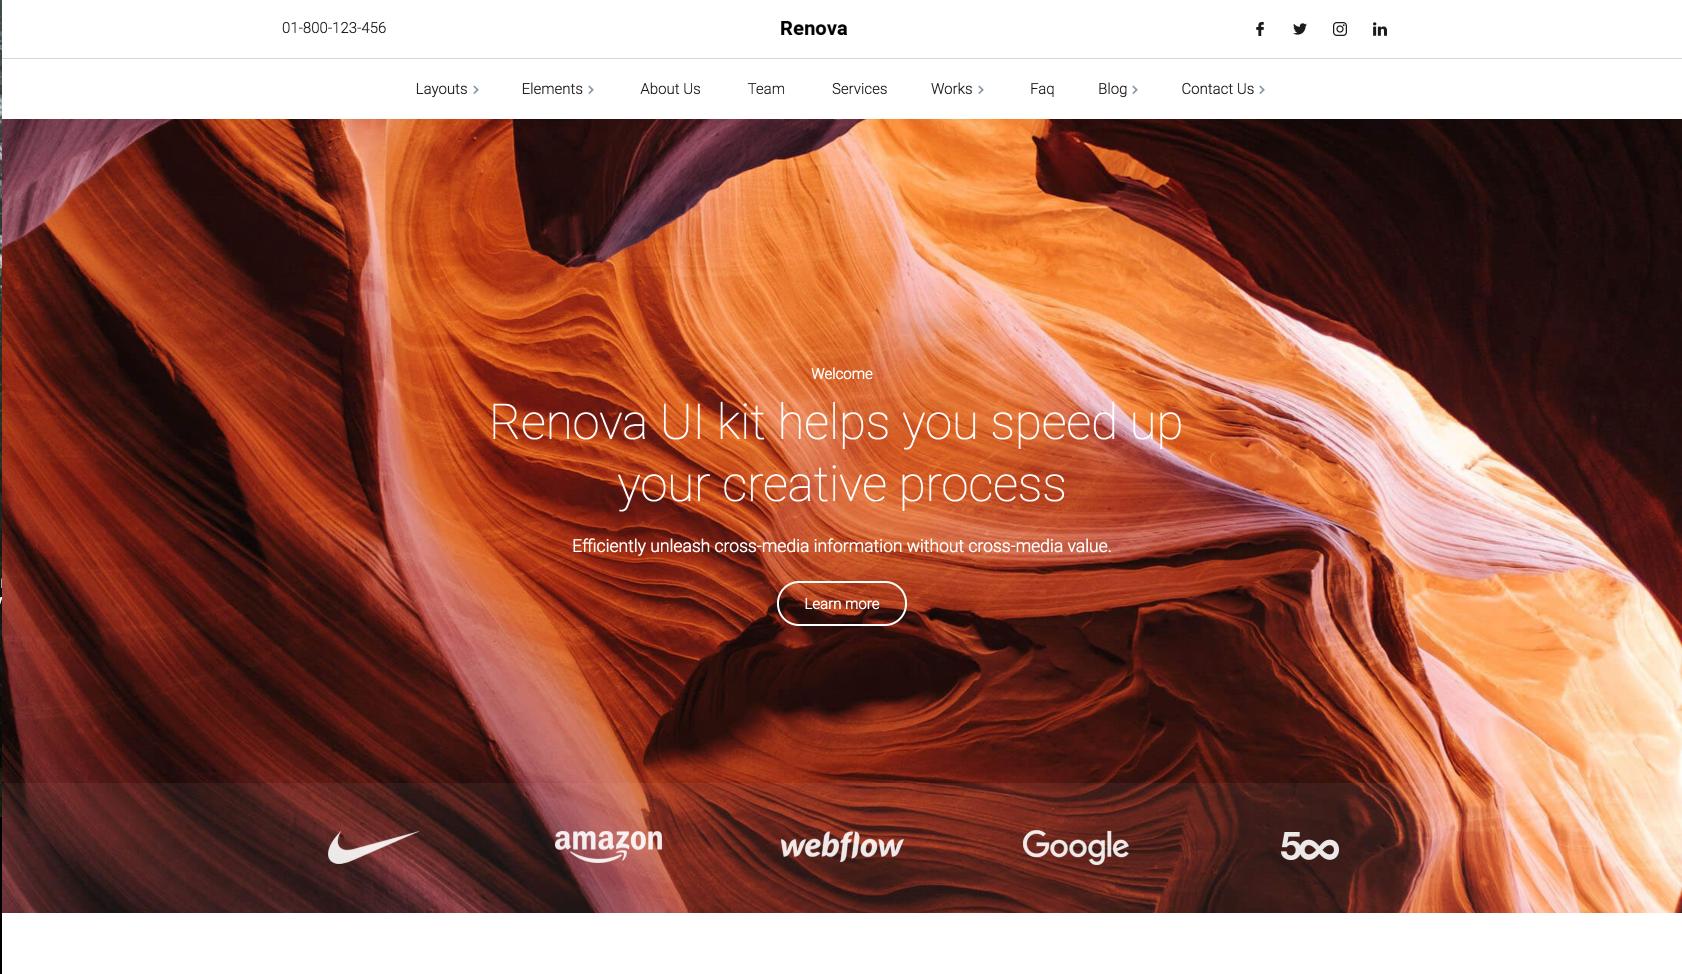 Homepage for Webflow template called Renova.